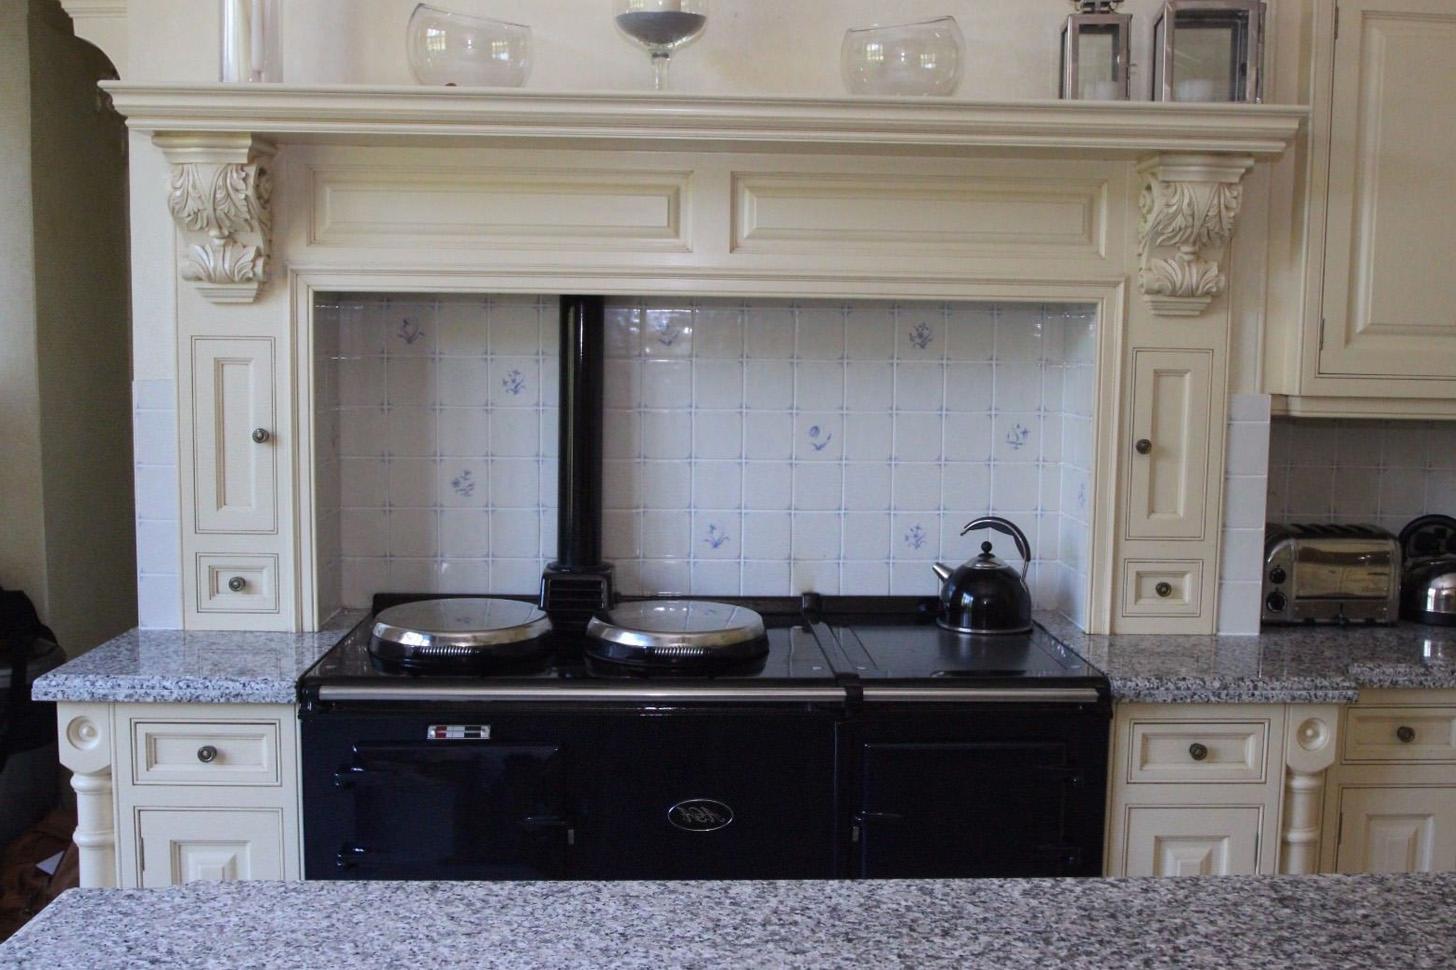 Klassische viktorianische Küche 6